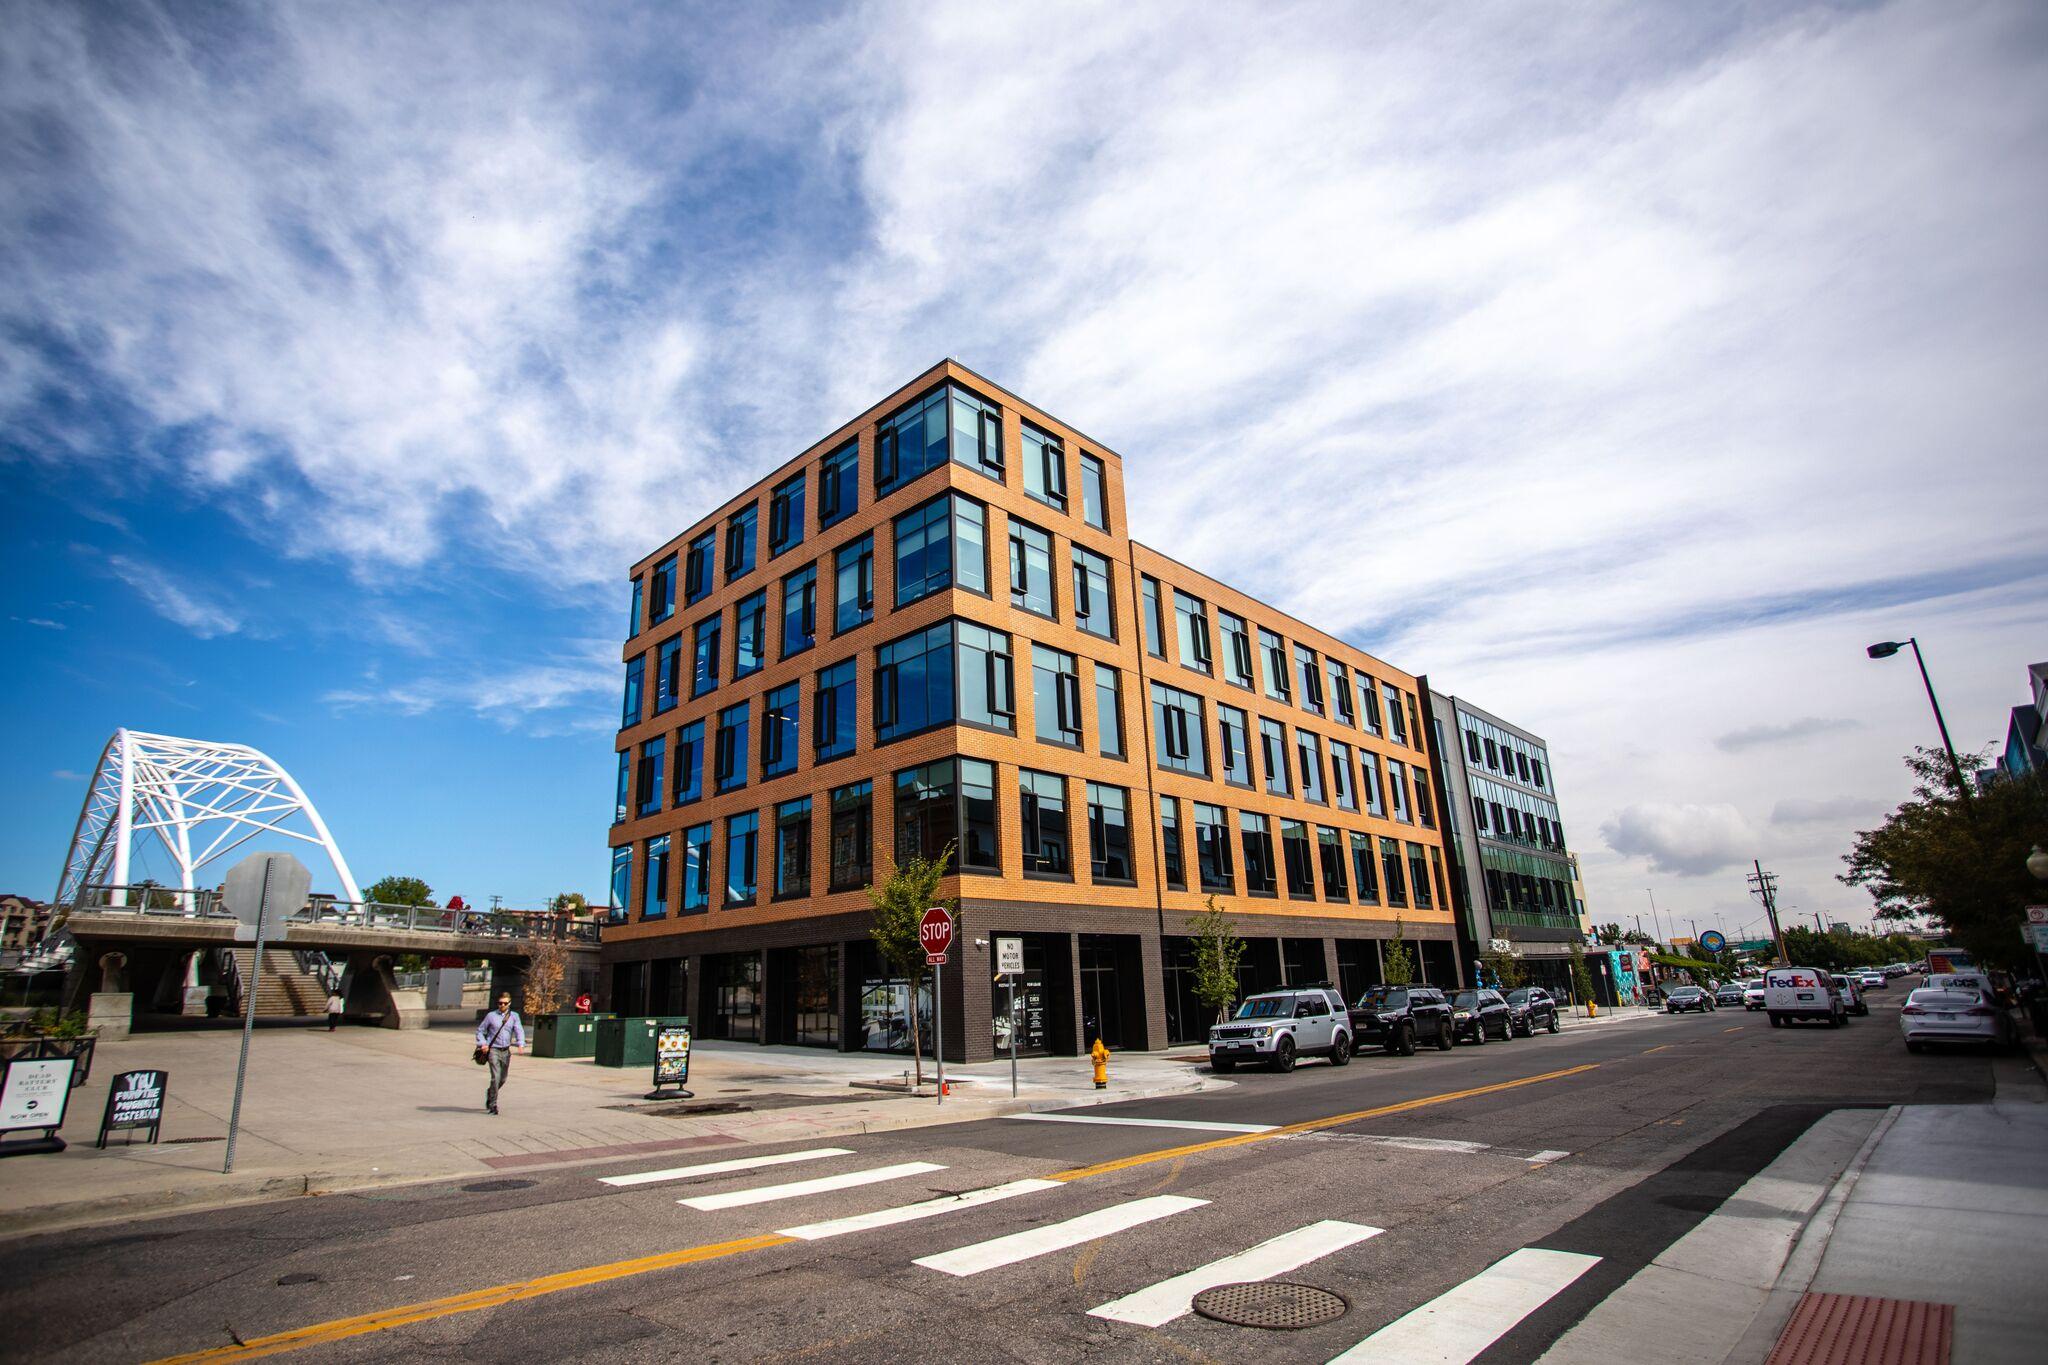 The Circa Building in LoDo Denver